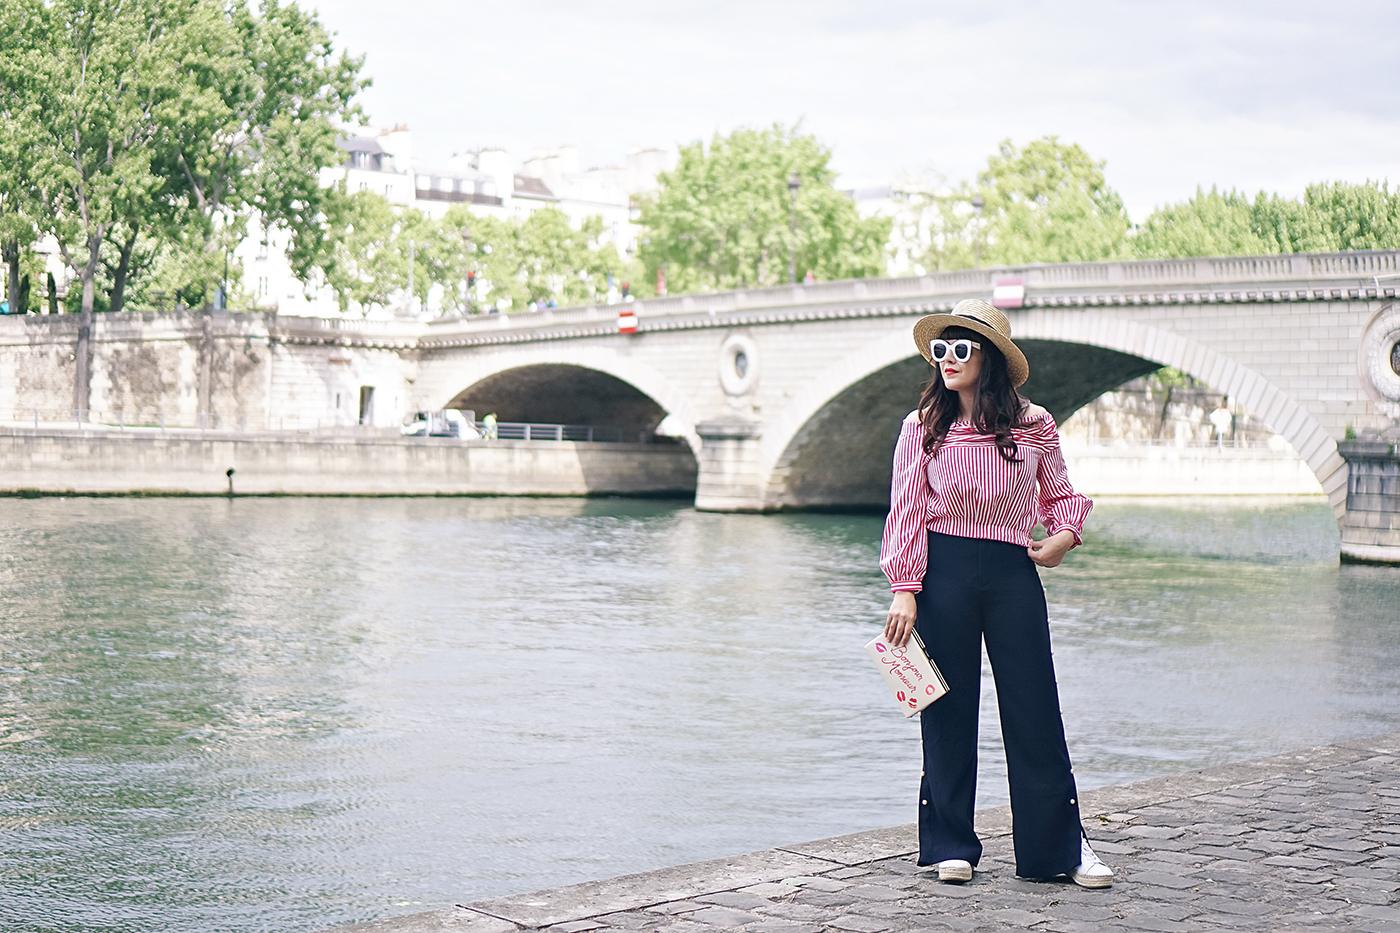 A Modern Flâneur in Paris